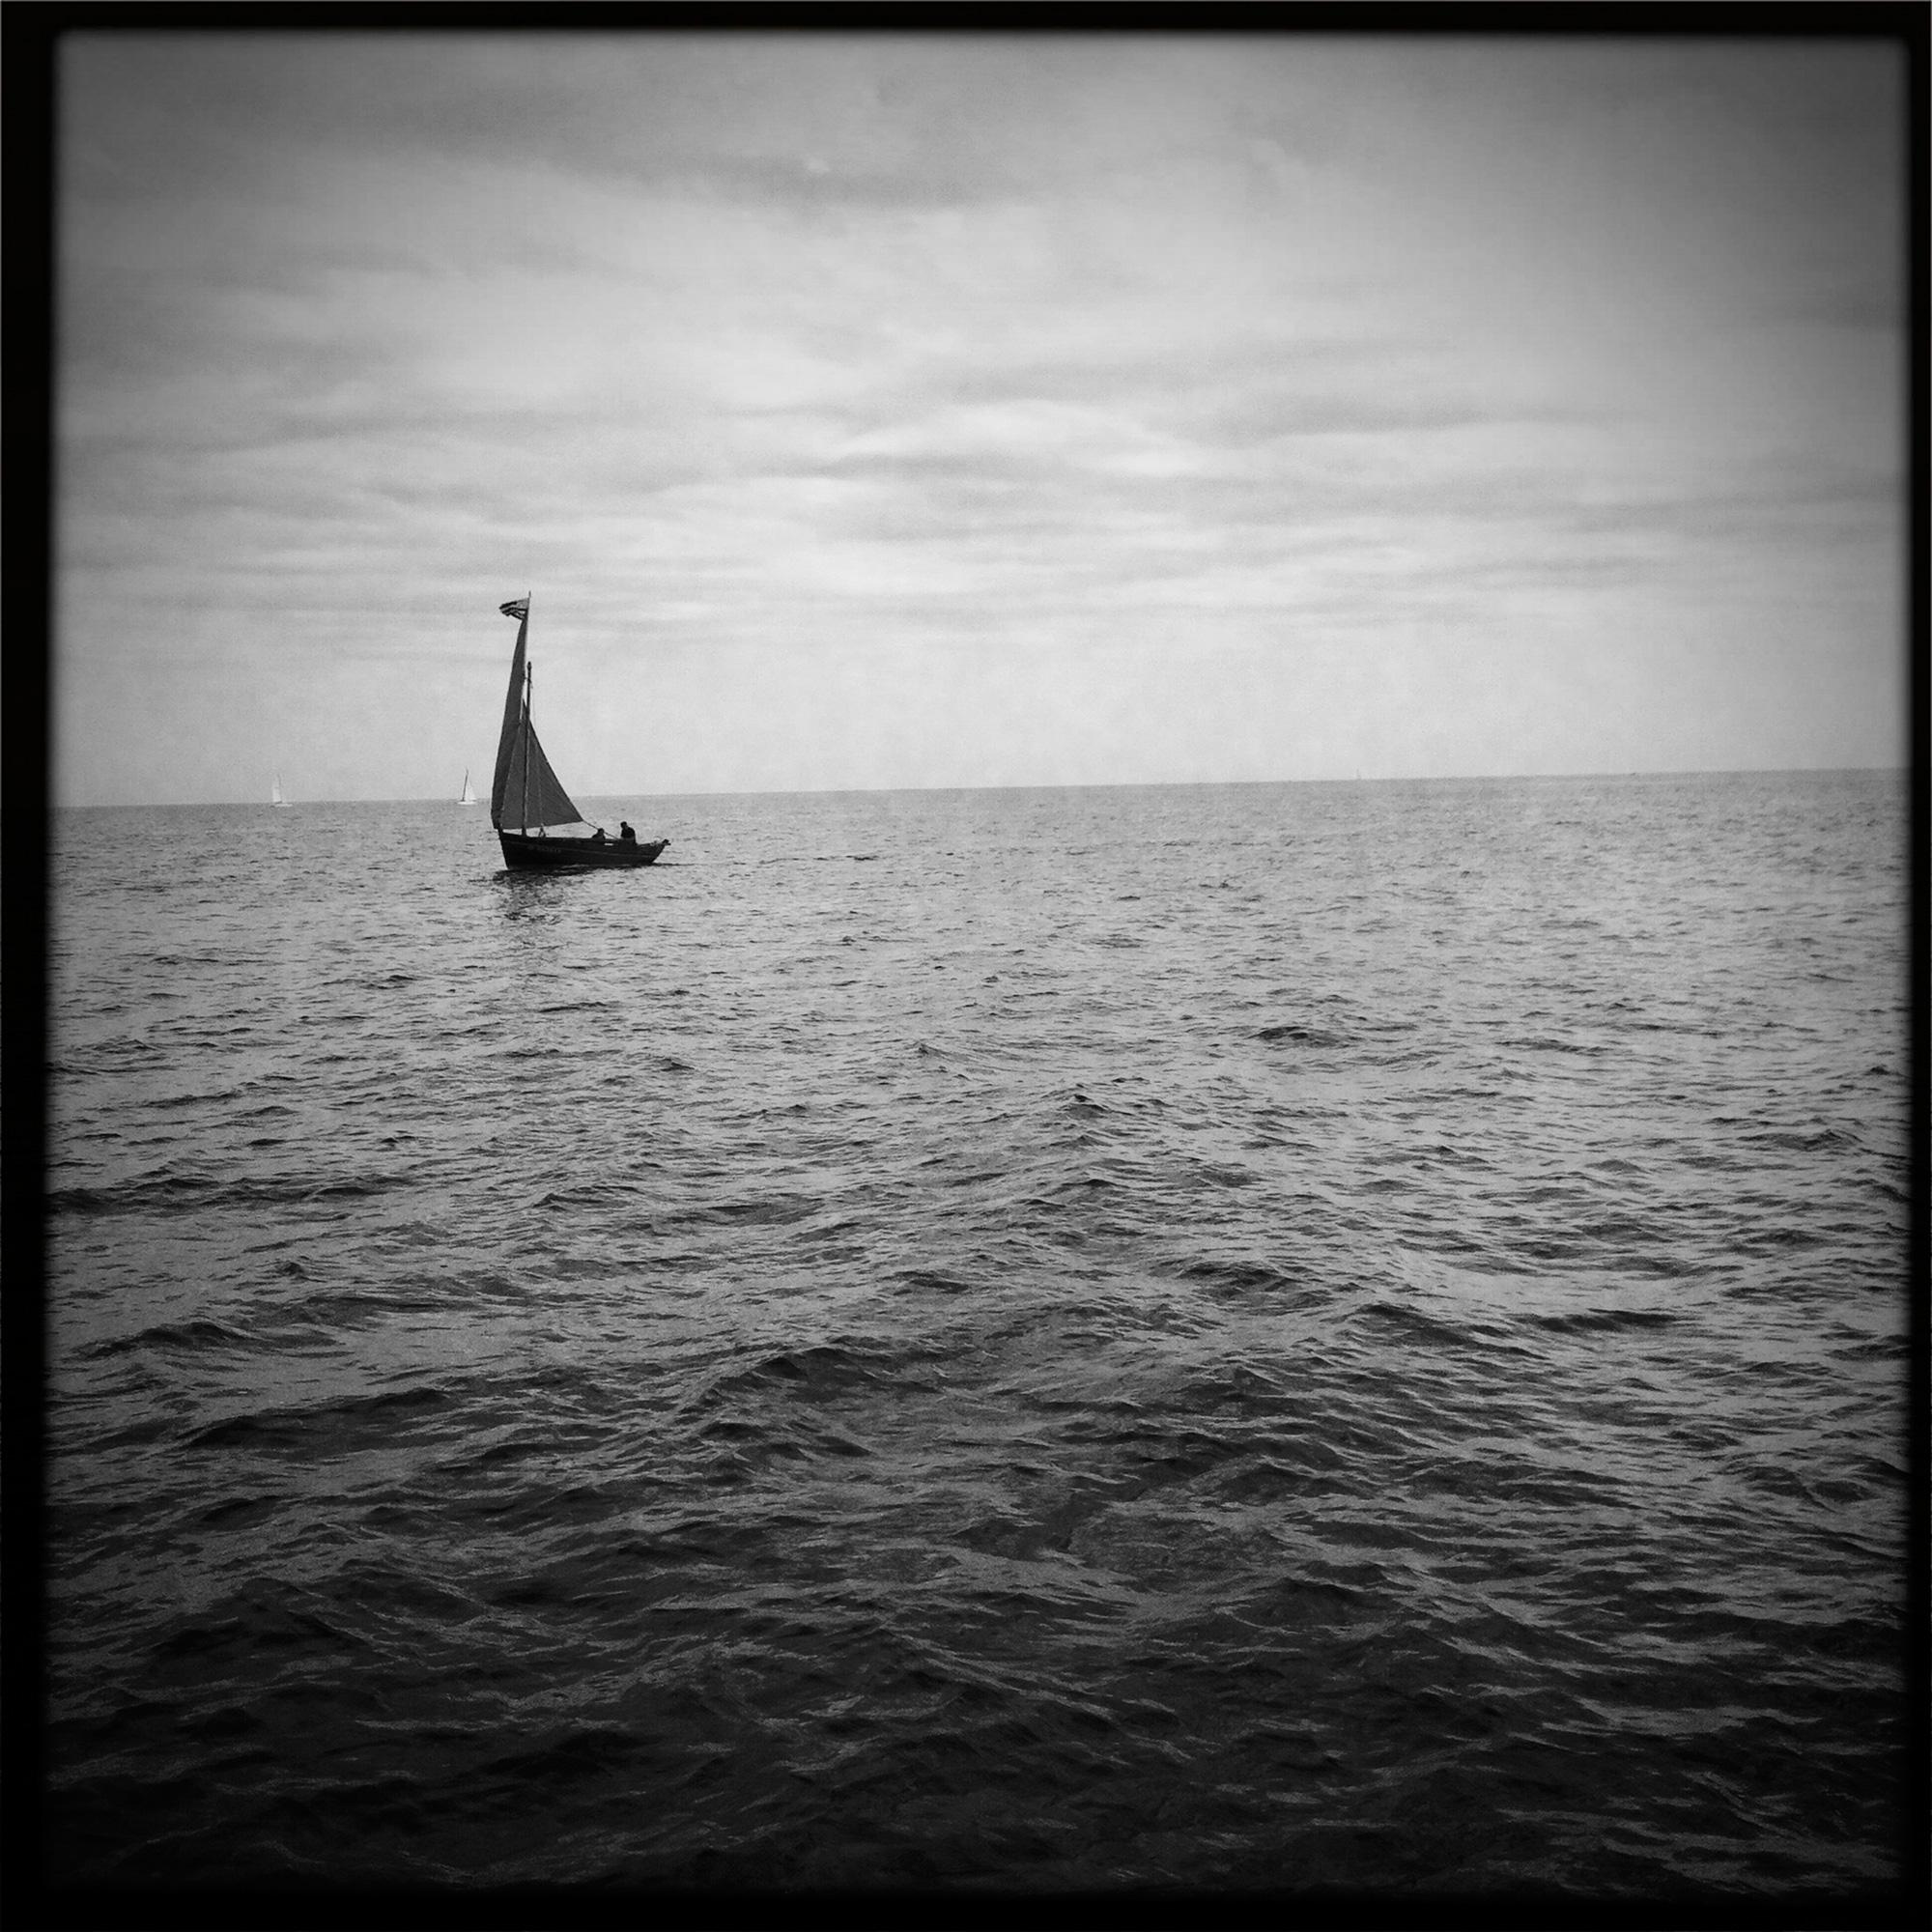 SailBoat_Brittany_01.jpg